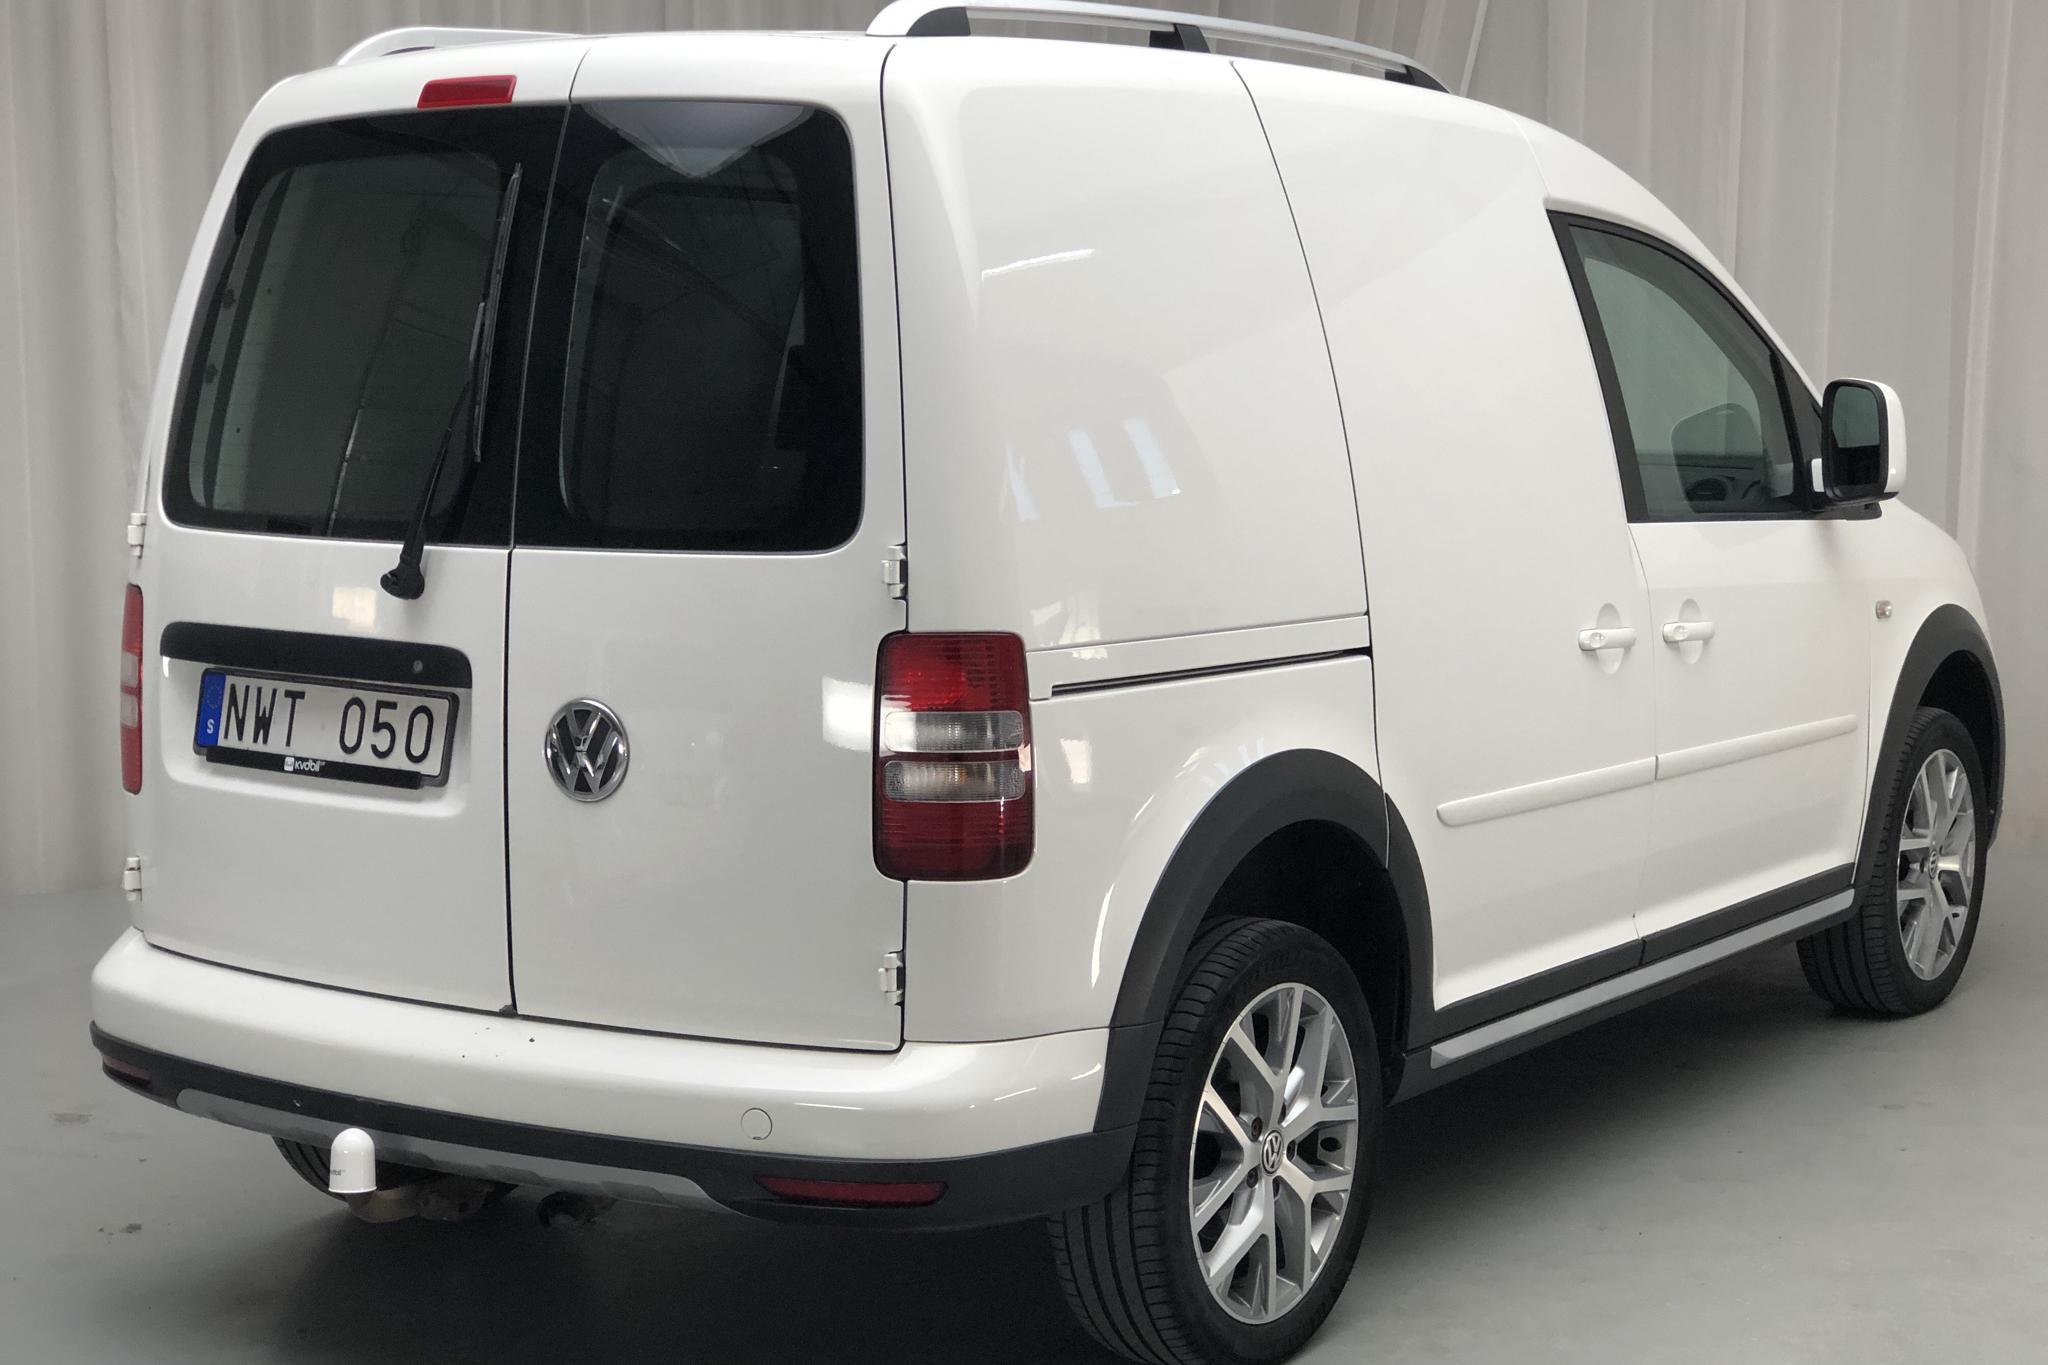 VW Caddy Cross 2.0 TDI Skåp 4-motion (110hk) - 17 448 mil - Manuell - Light Blue - 2014